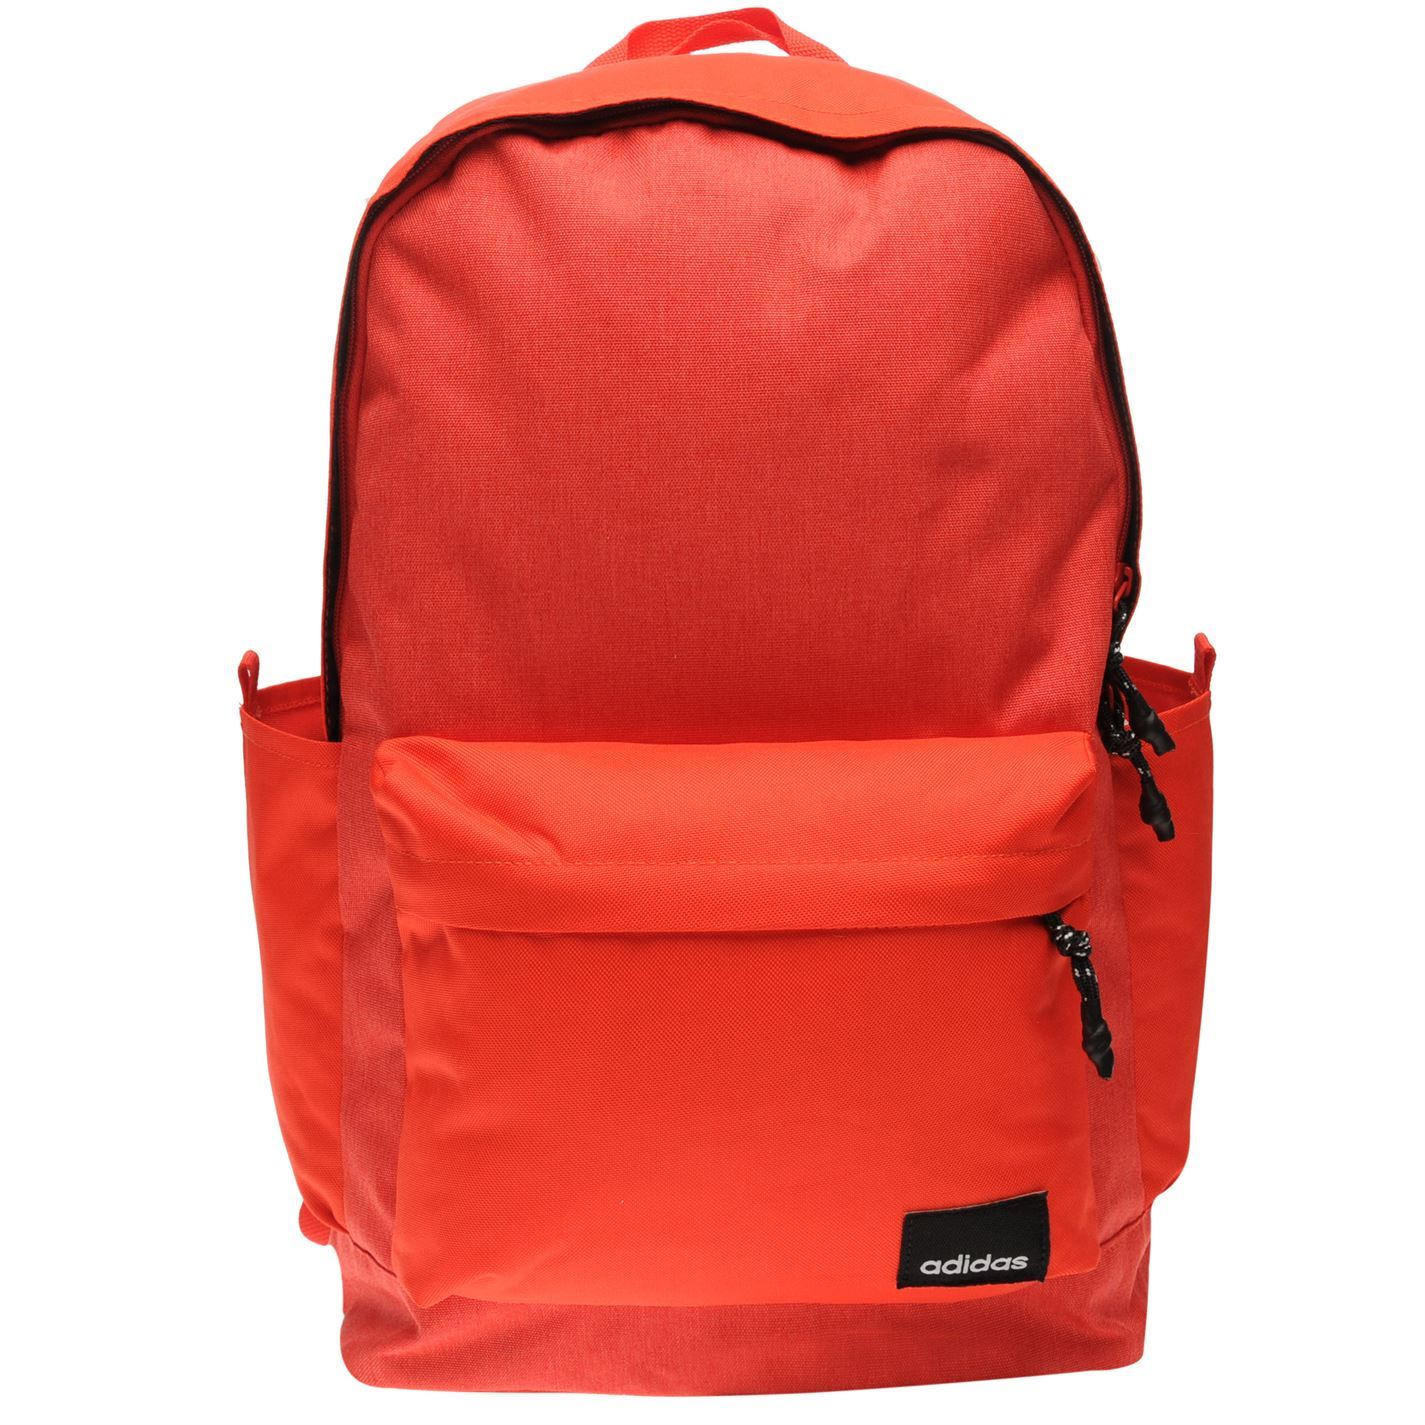 Bolsa Adidas Gimnasio Carry Diario Deporte Mochila Rojo All W92HIYED